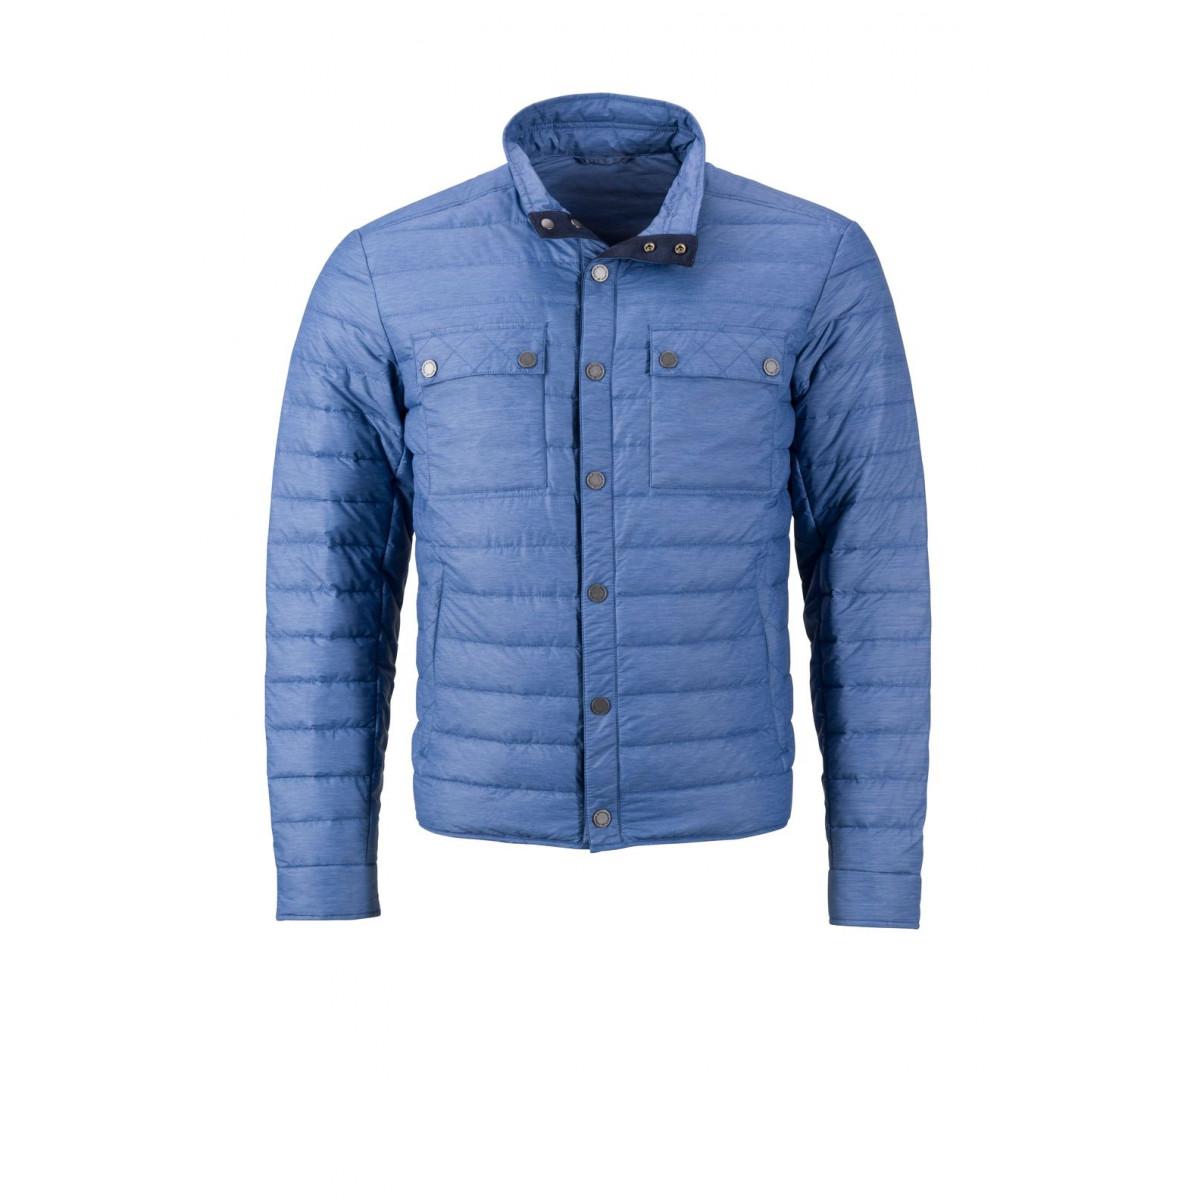 Куртка мужская JN1106 Mens Lightweight Down Jacket - Джинс меланж